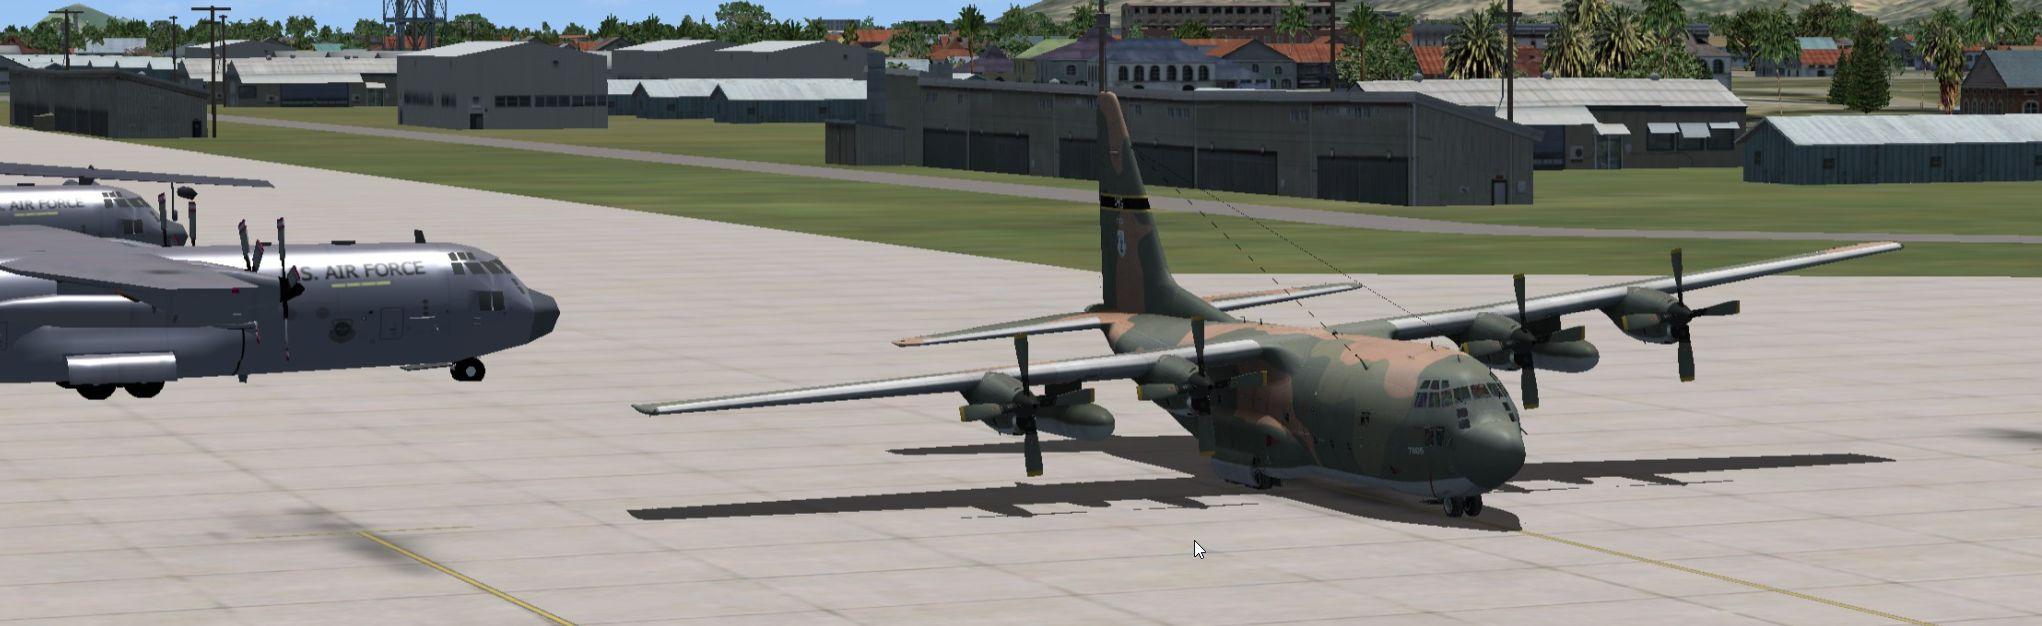 tilting_C-130.jpg